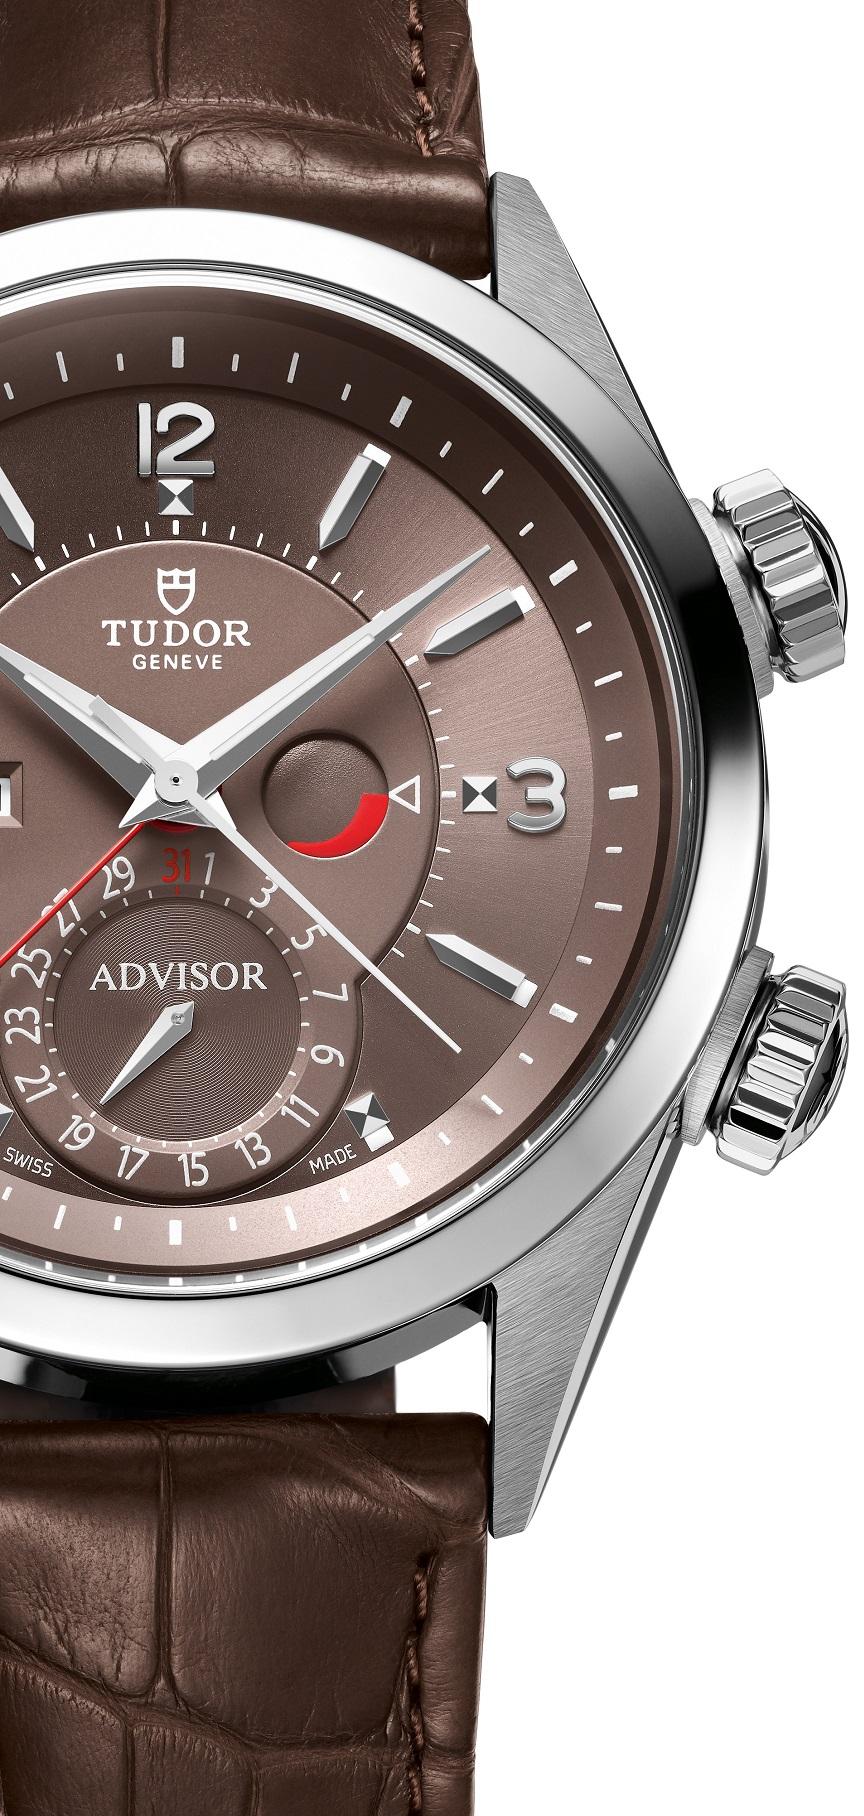 Tudor Heritage Advisor m79620tc-0001_cognac_leather_cognac_f_xl_rvb